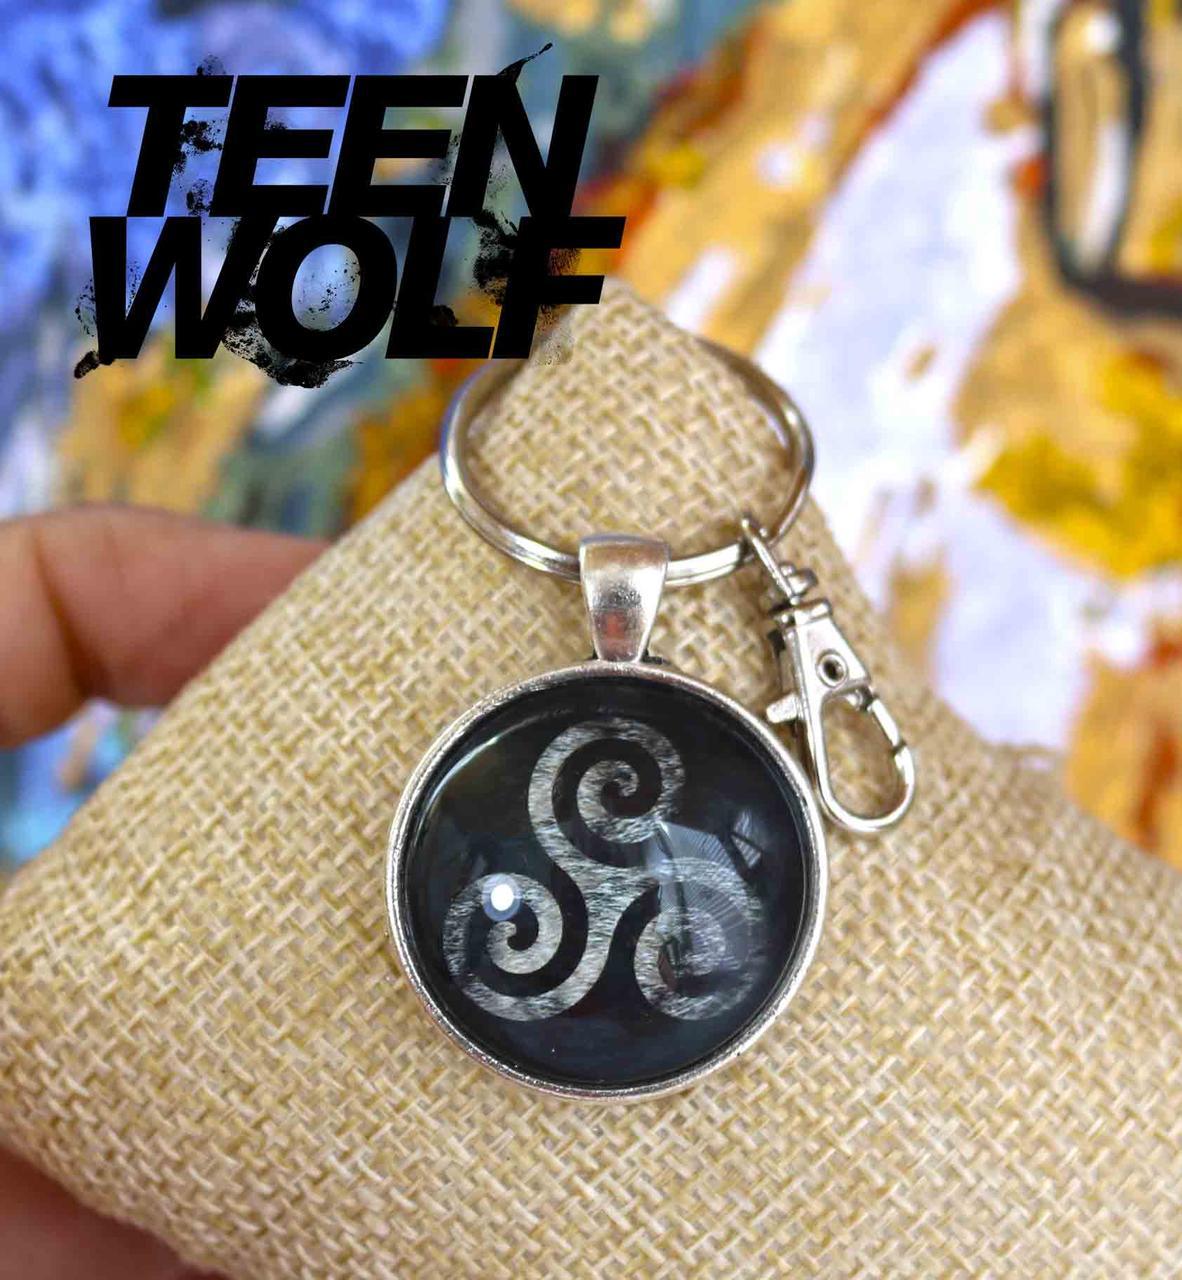 Брелок с логотипом Teen Wolf Волчонок